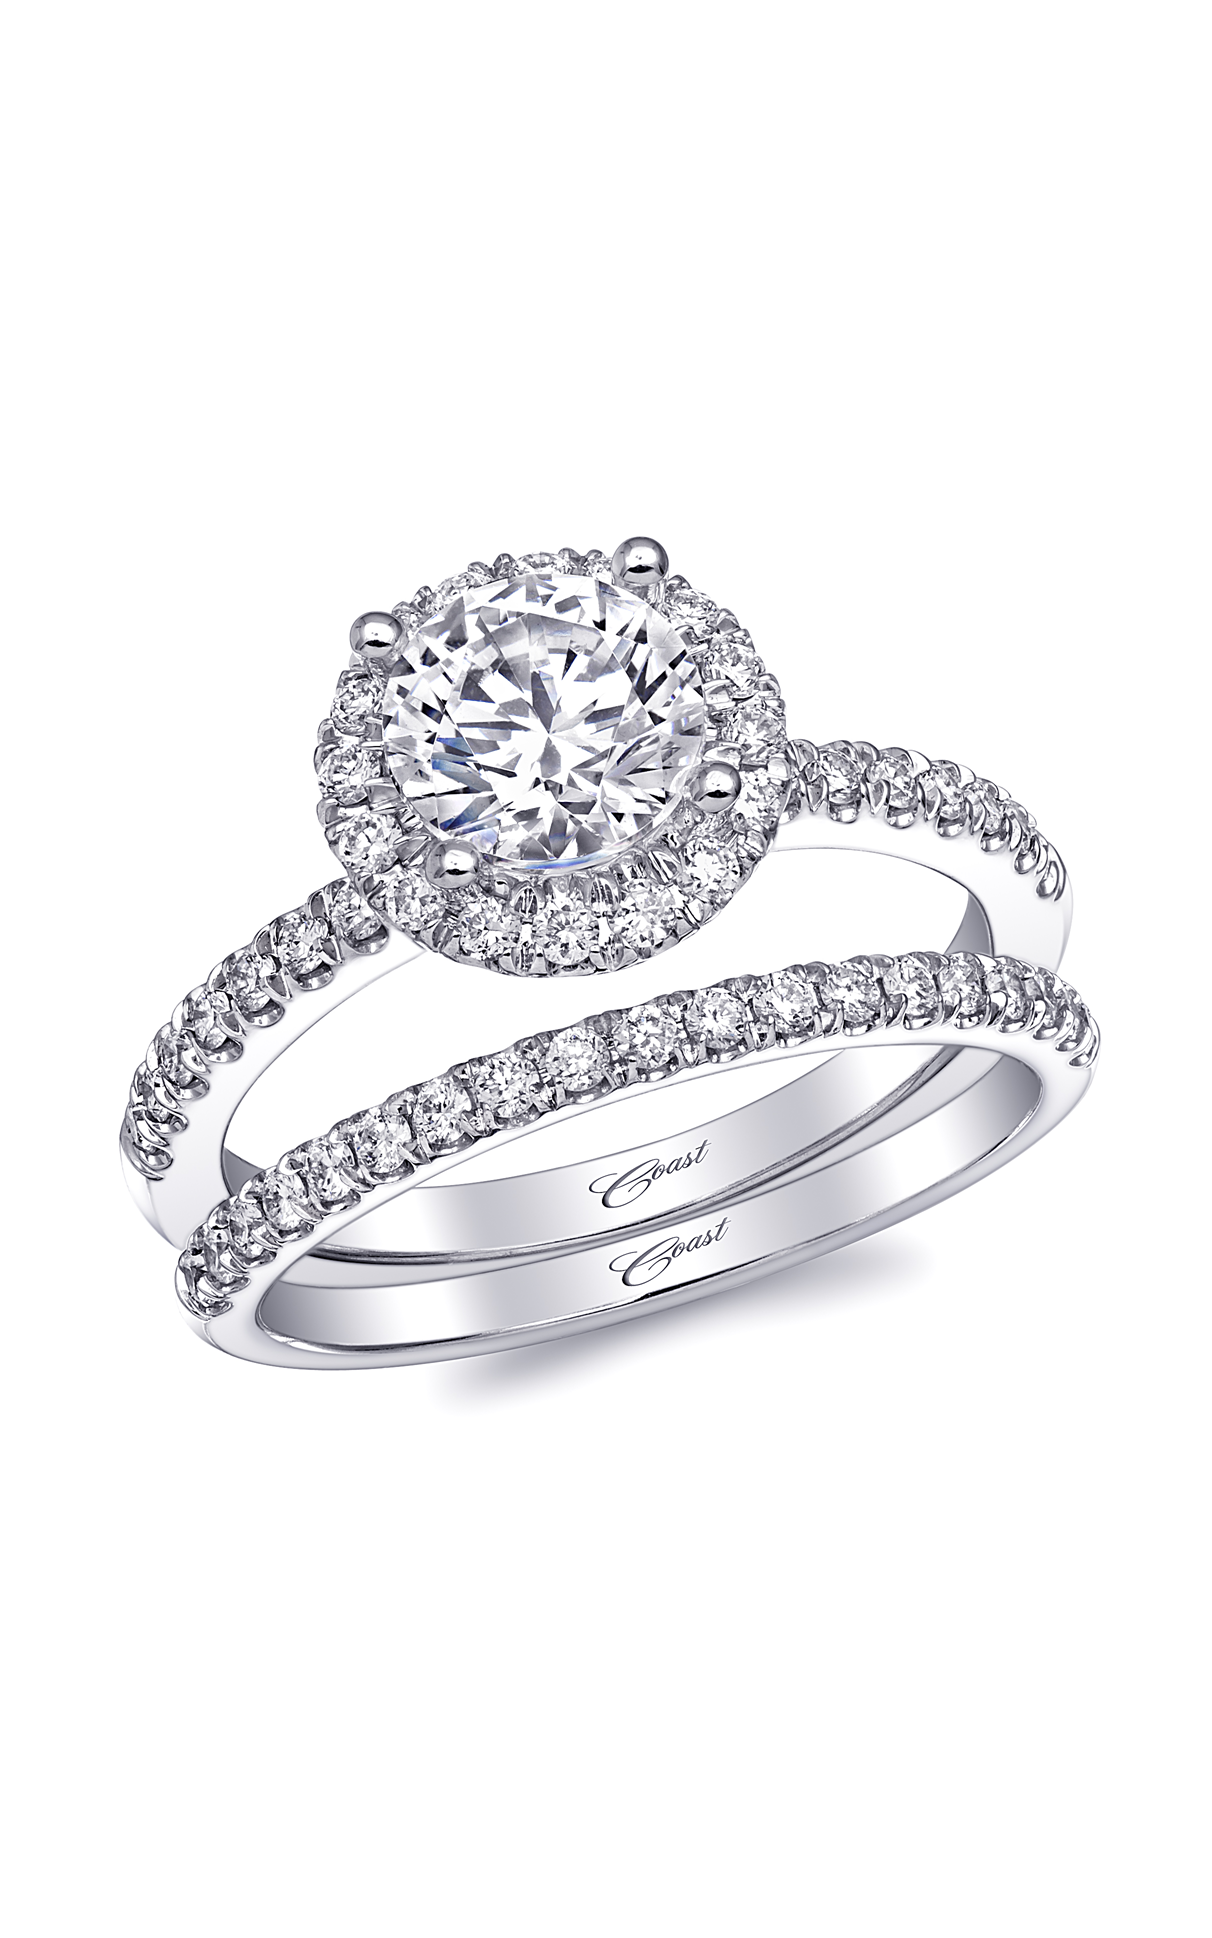 Coast Diamond Charisma LC5408 product image